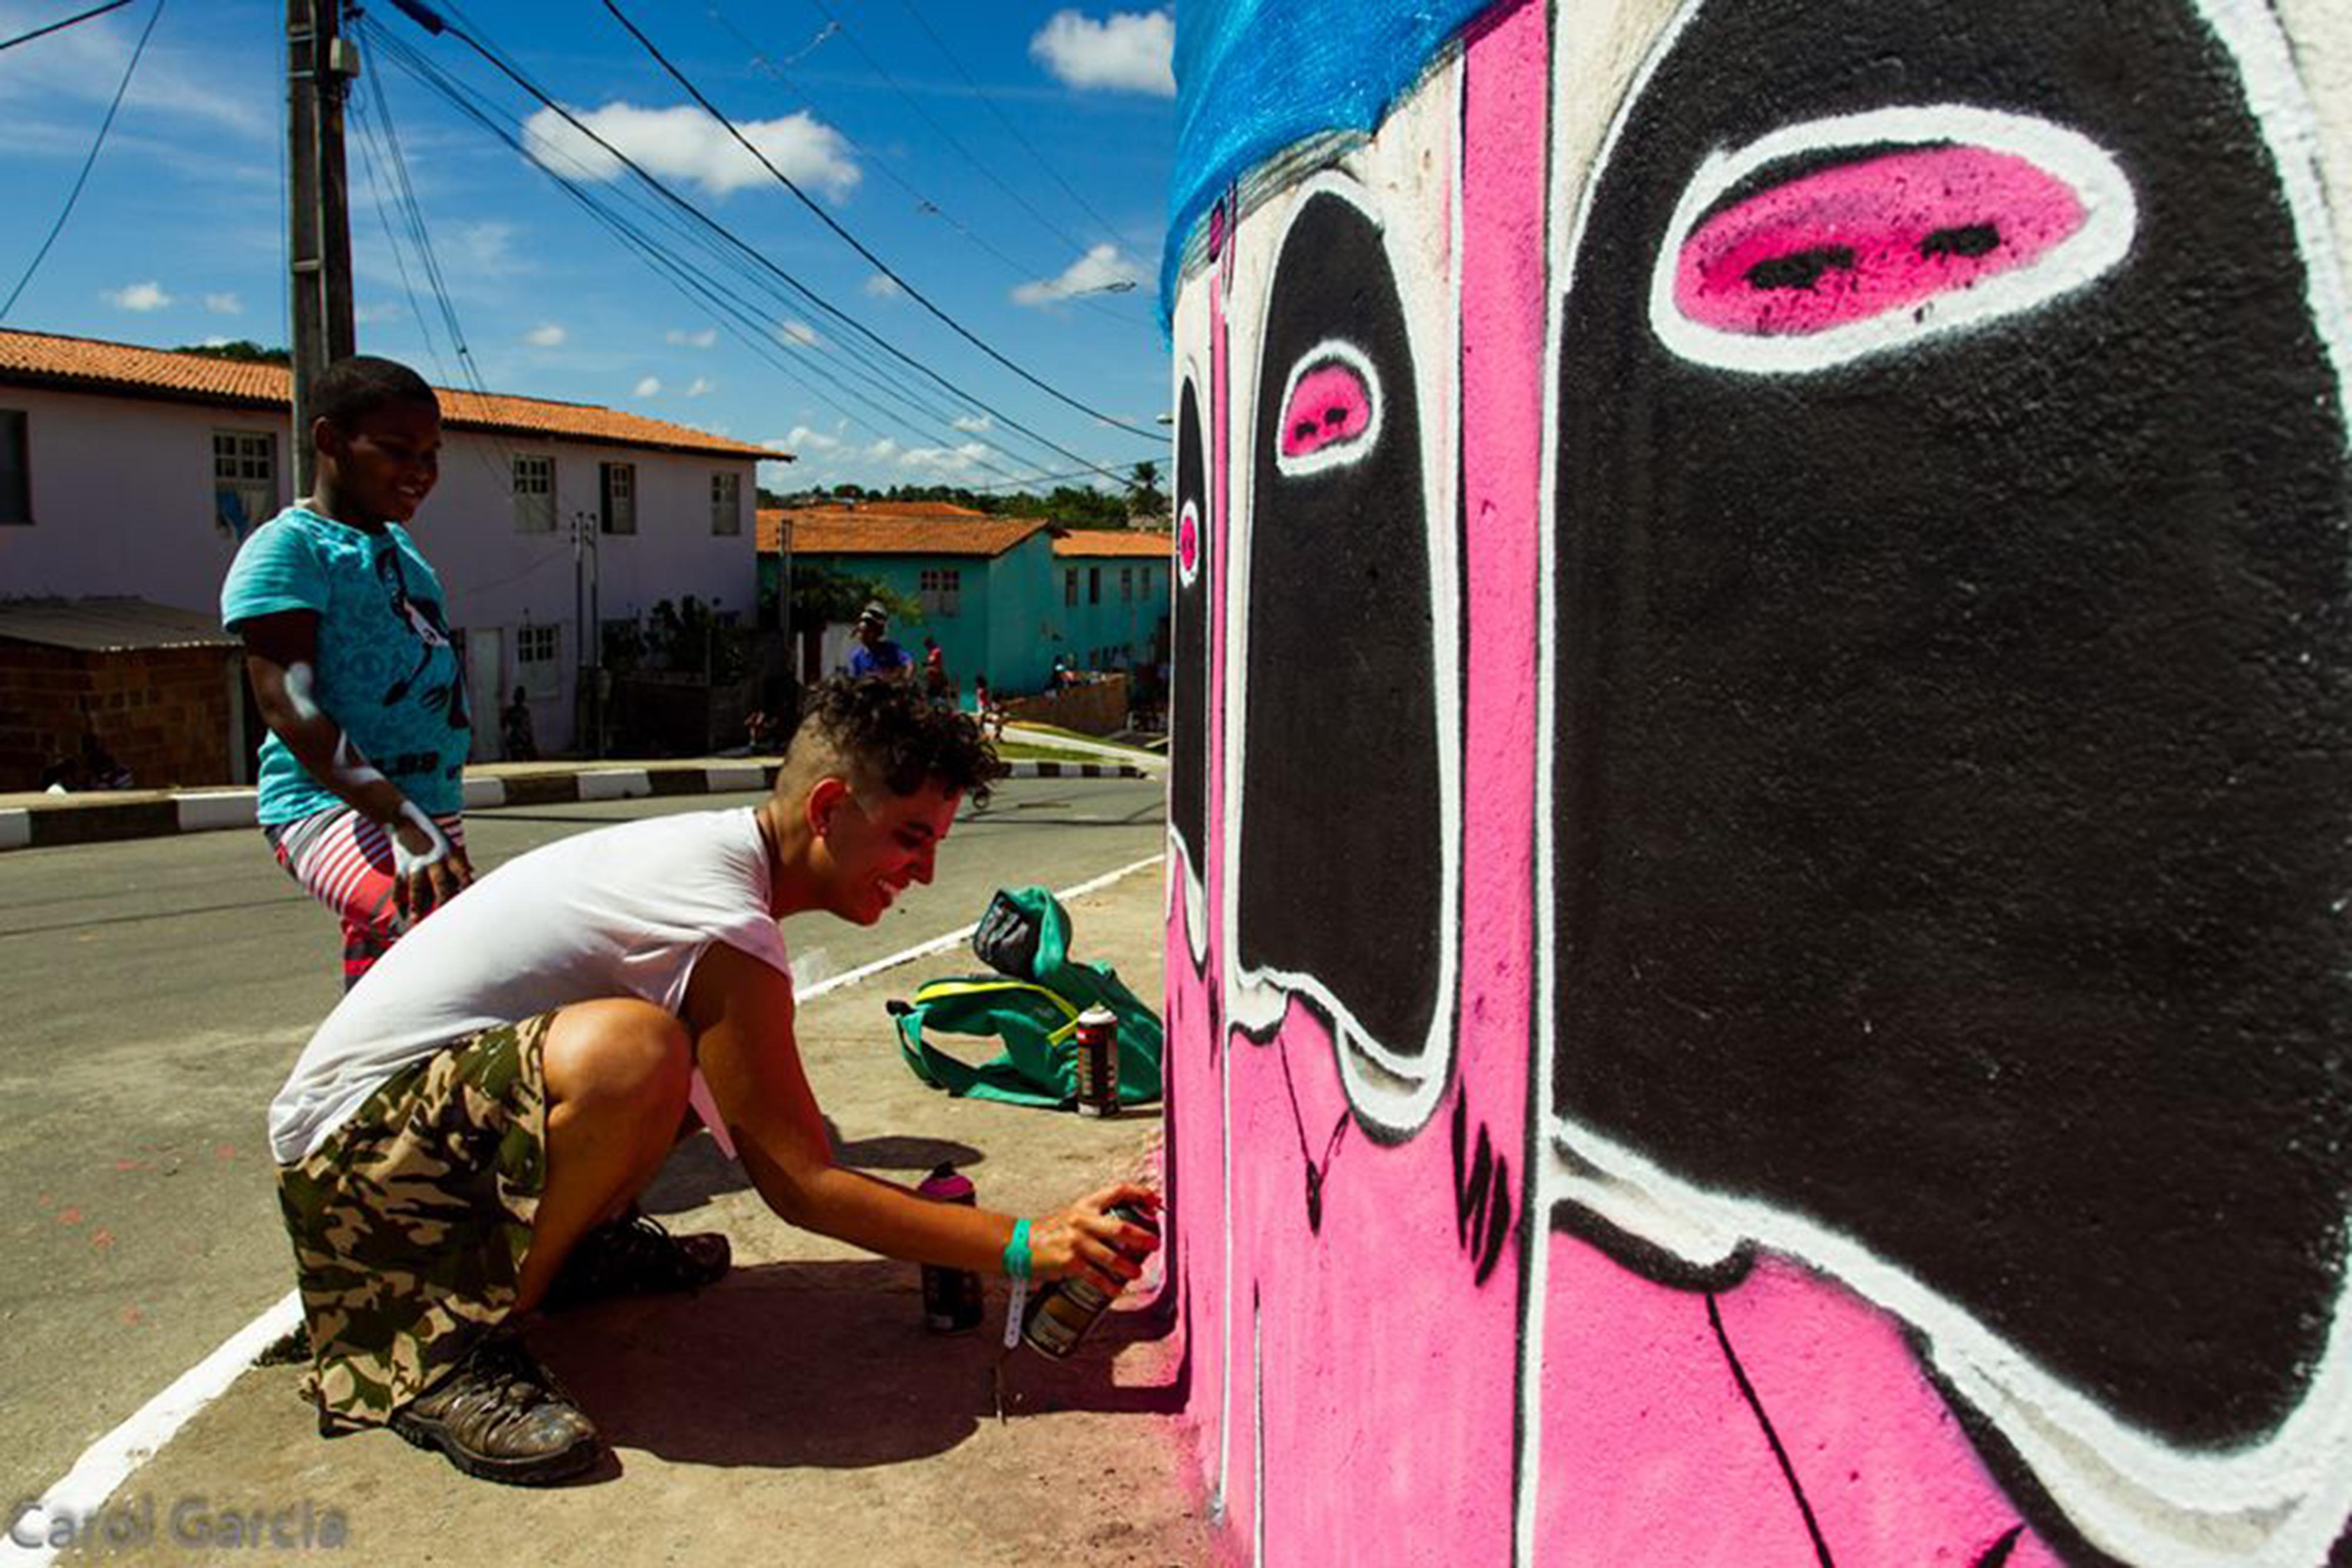 Artista baiana ilustra outdoors e movimenta debate sobre genero